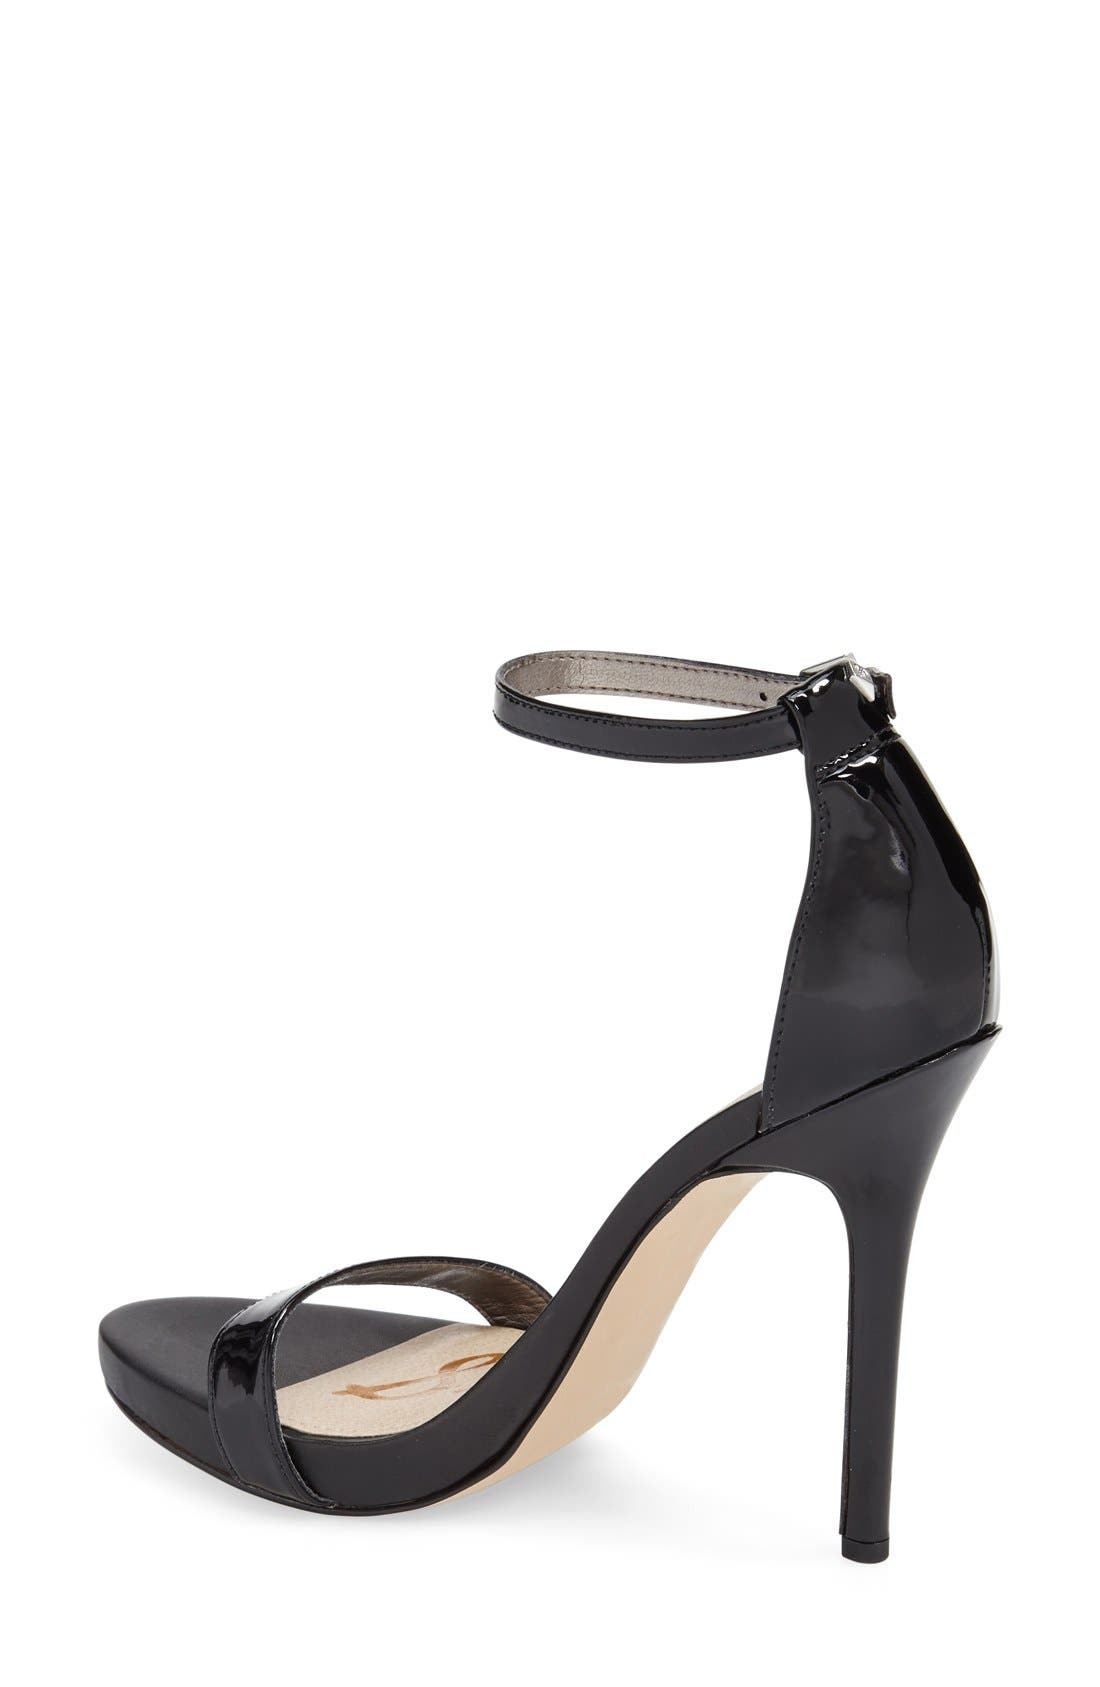 ,                             'Eleanor' Ankle Strap Sandal,                             Alternate thumbnail 26, color,                             005